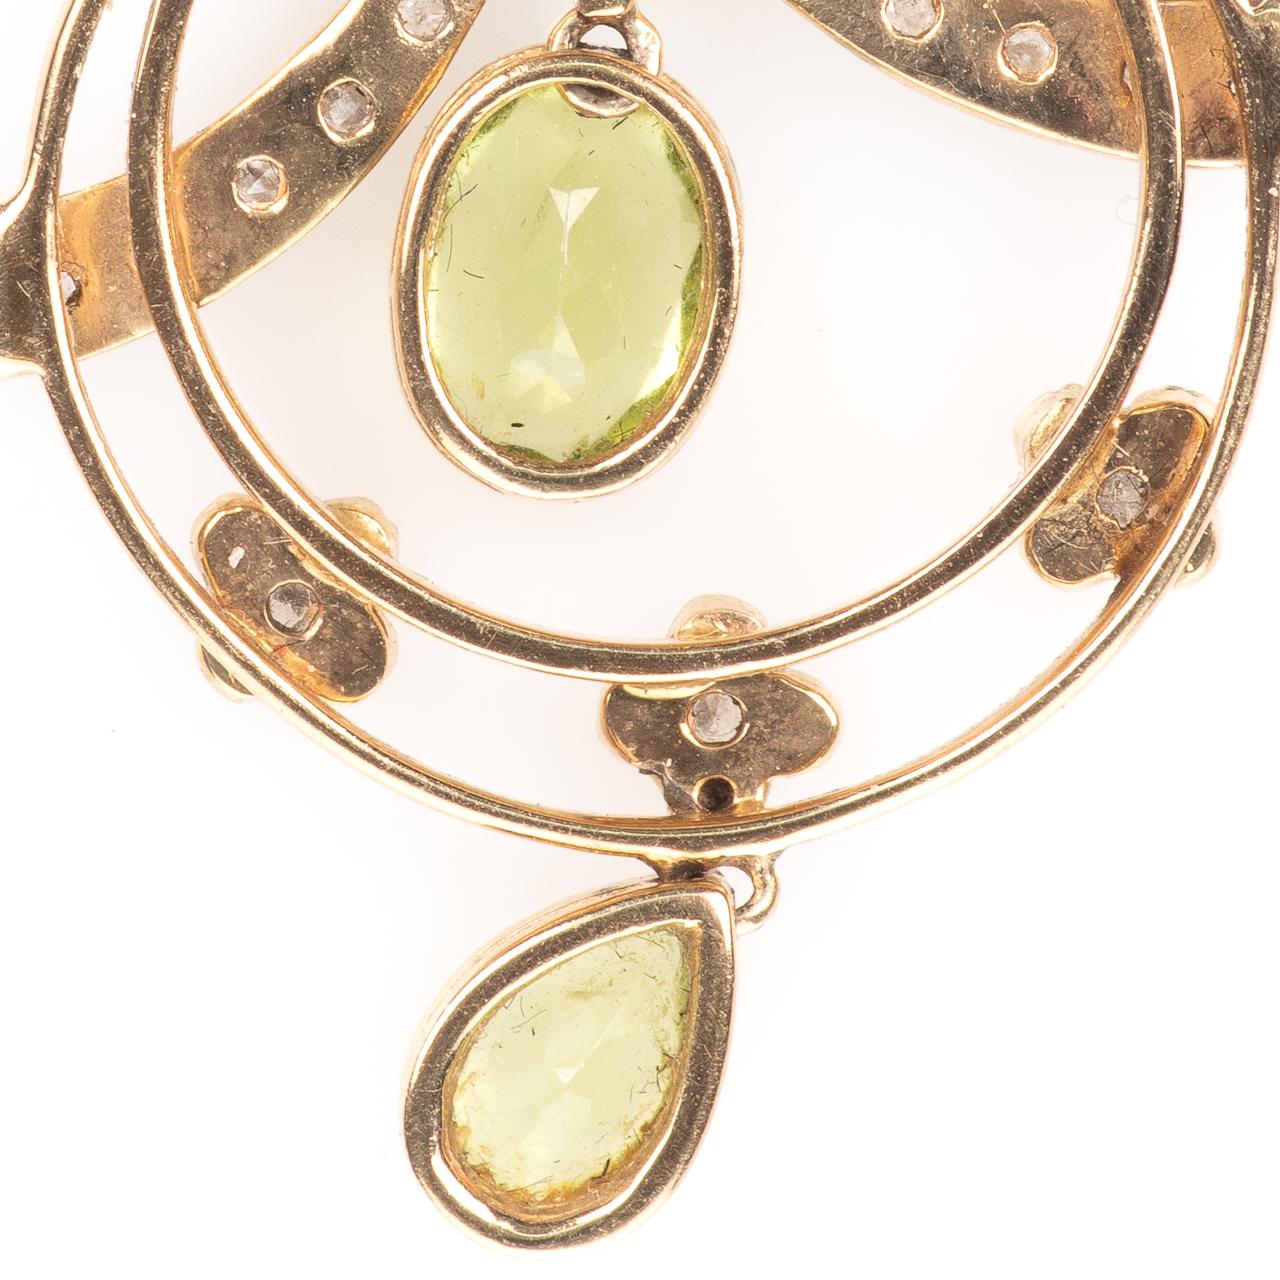 9ct Gold Art Nouveau Peridot & Diamond Pendant - Image 5 of 6